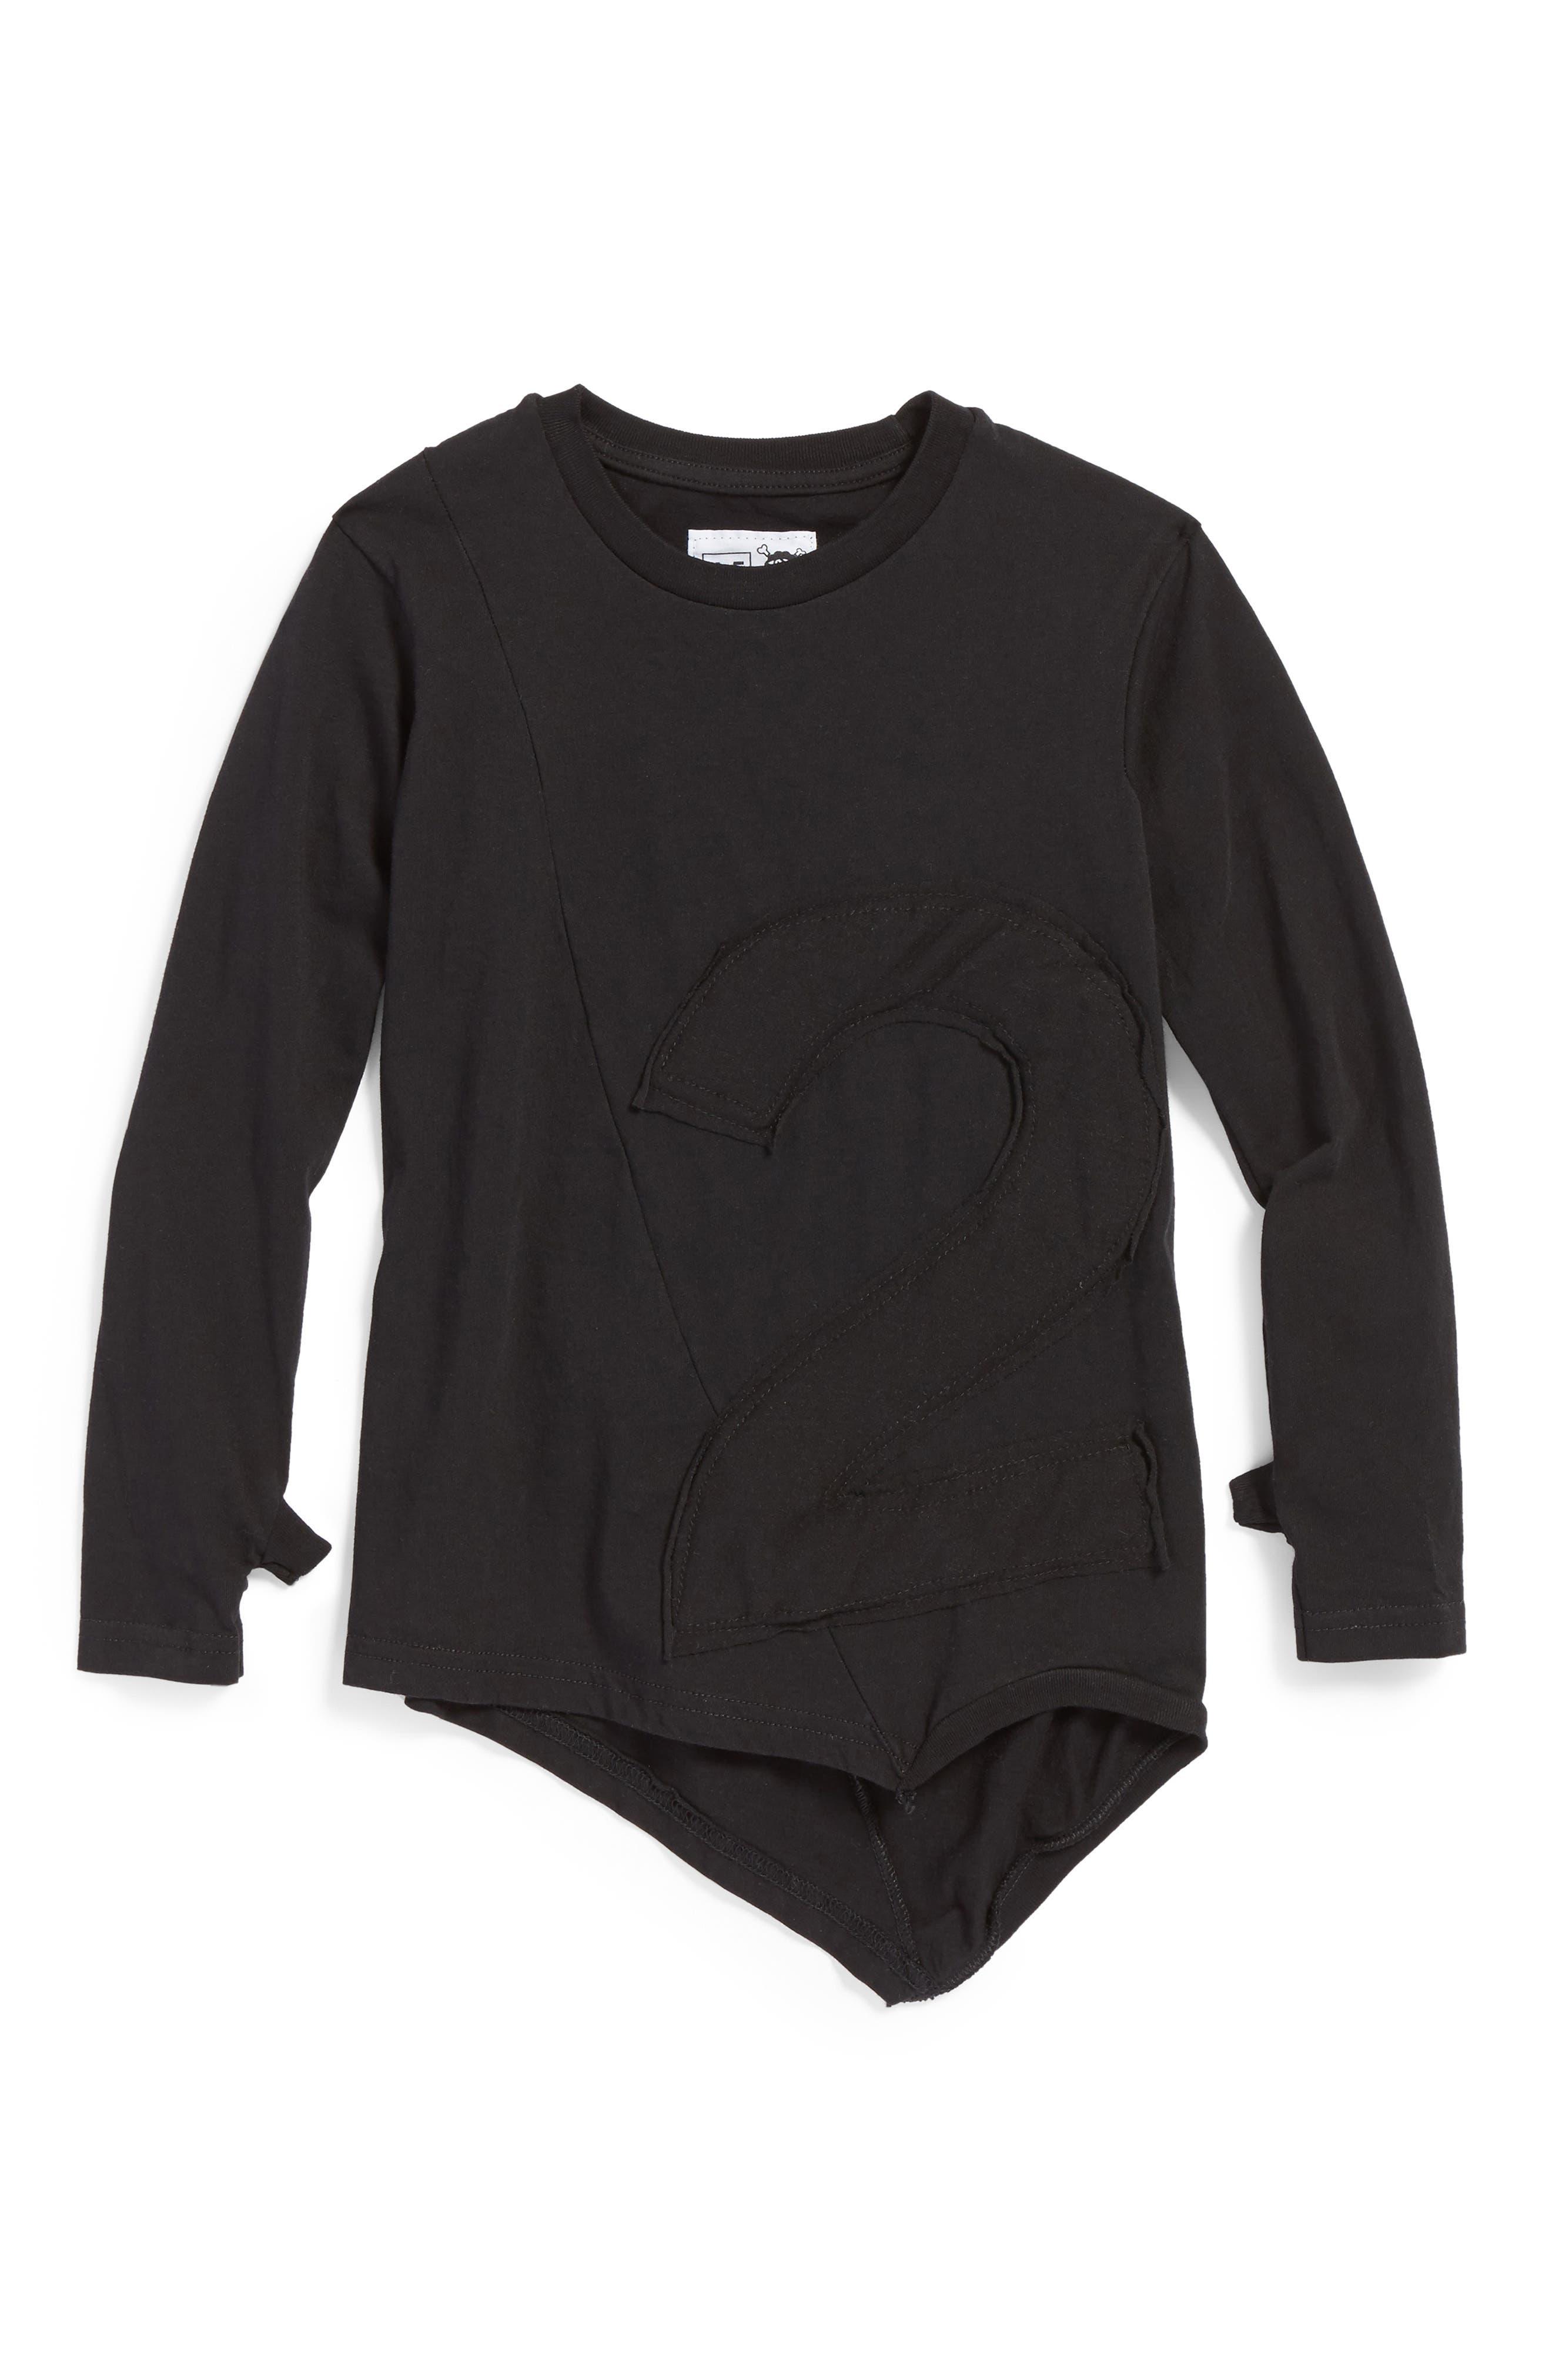 Puffy Number Penguin Shirt,                             Main thumbnail 1, color,                             Black